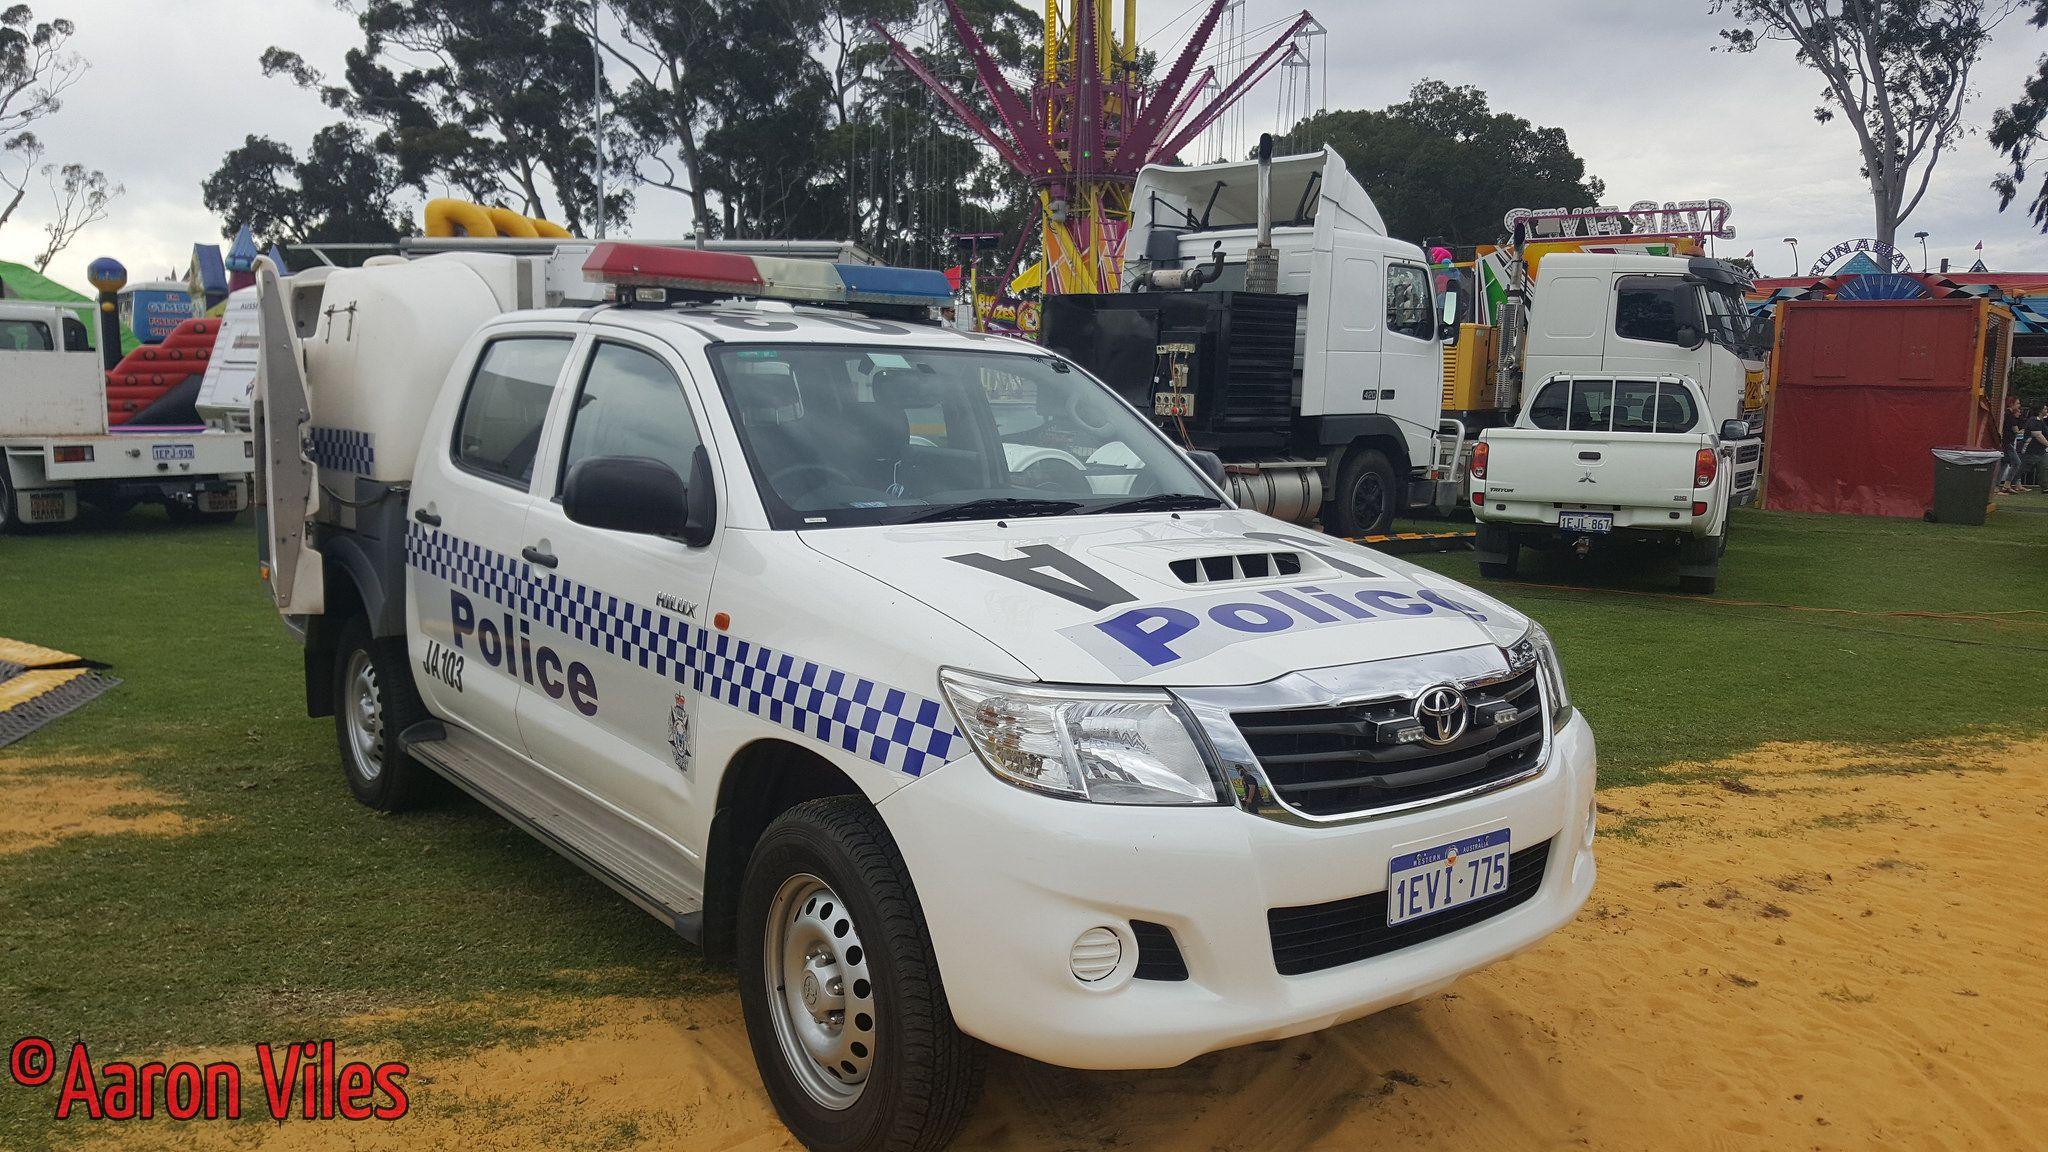 Western Australia Police Wa Police Vehicles Pinterest Police